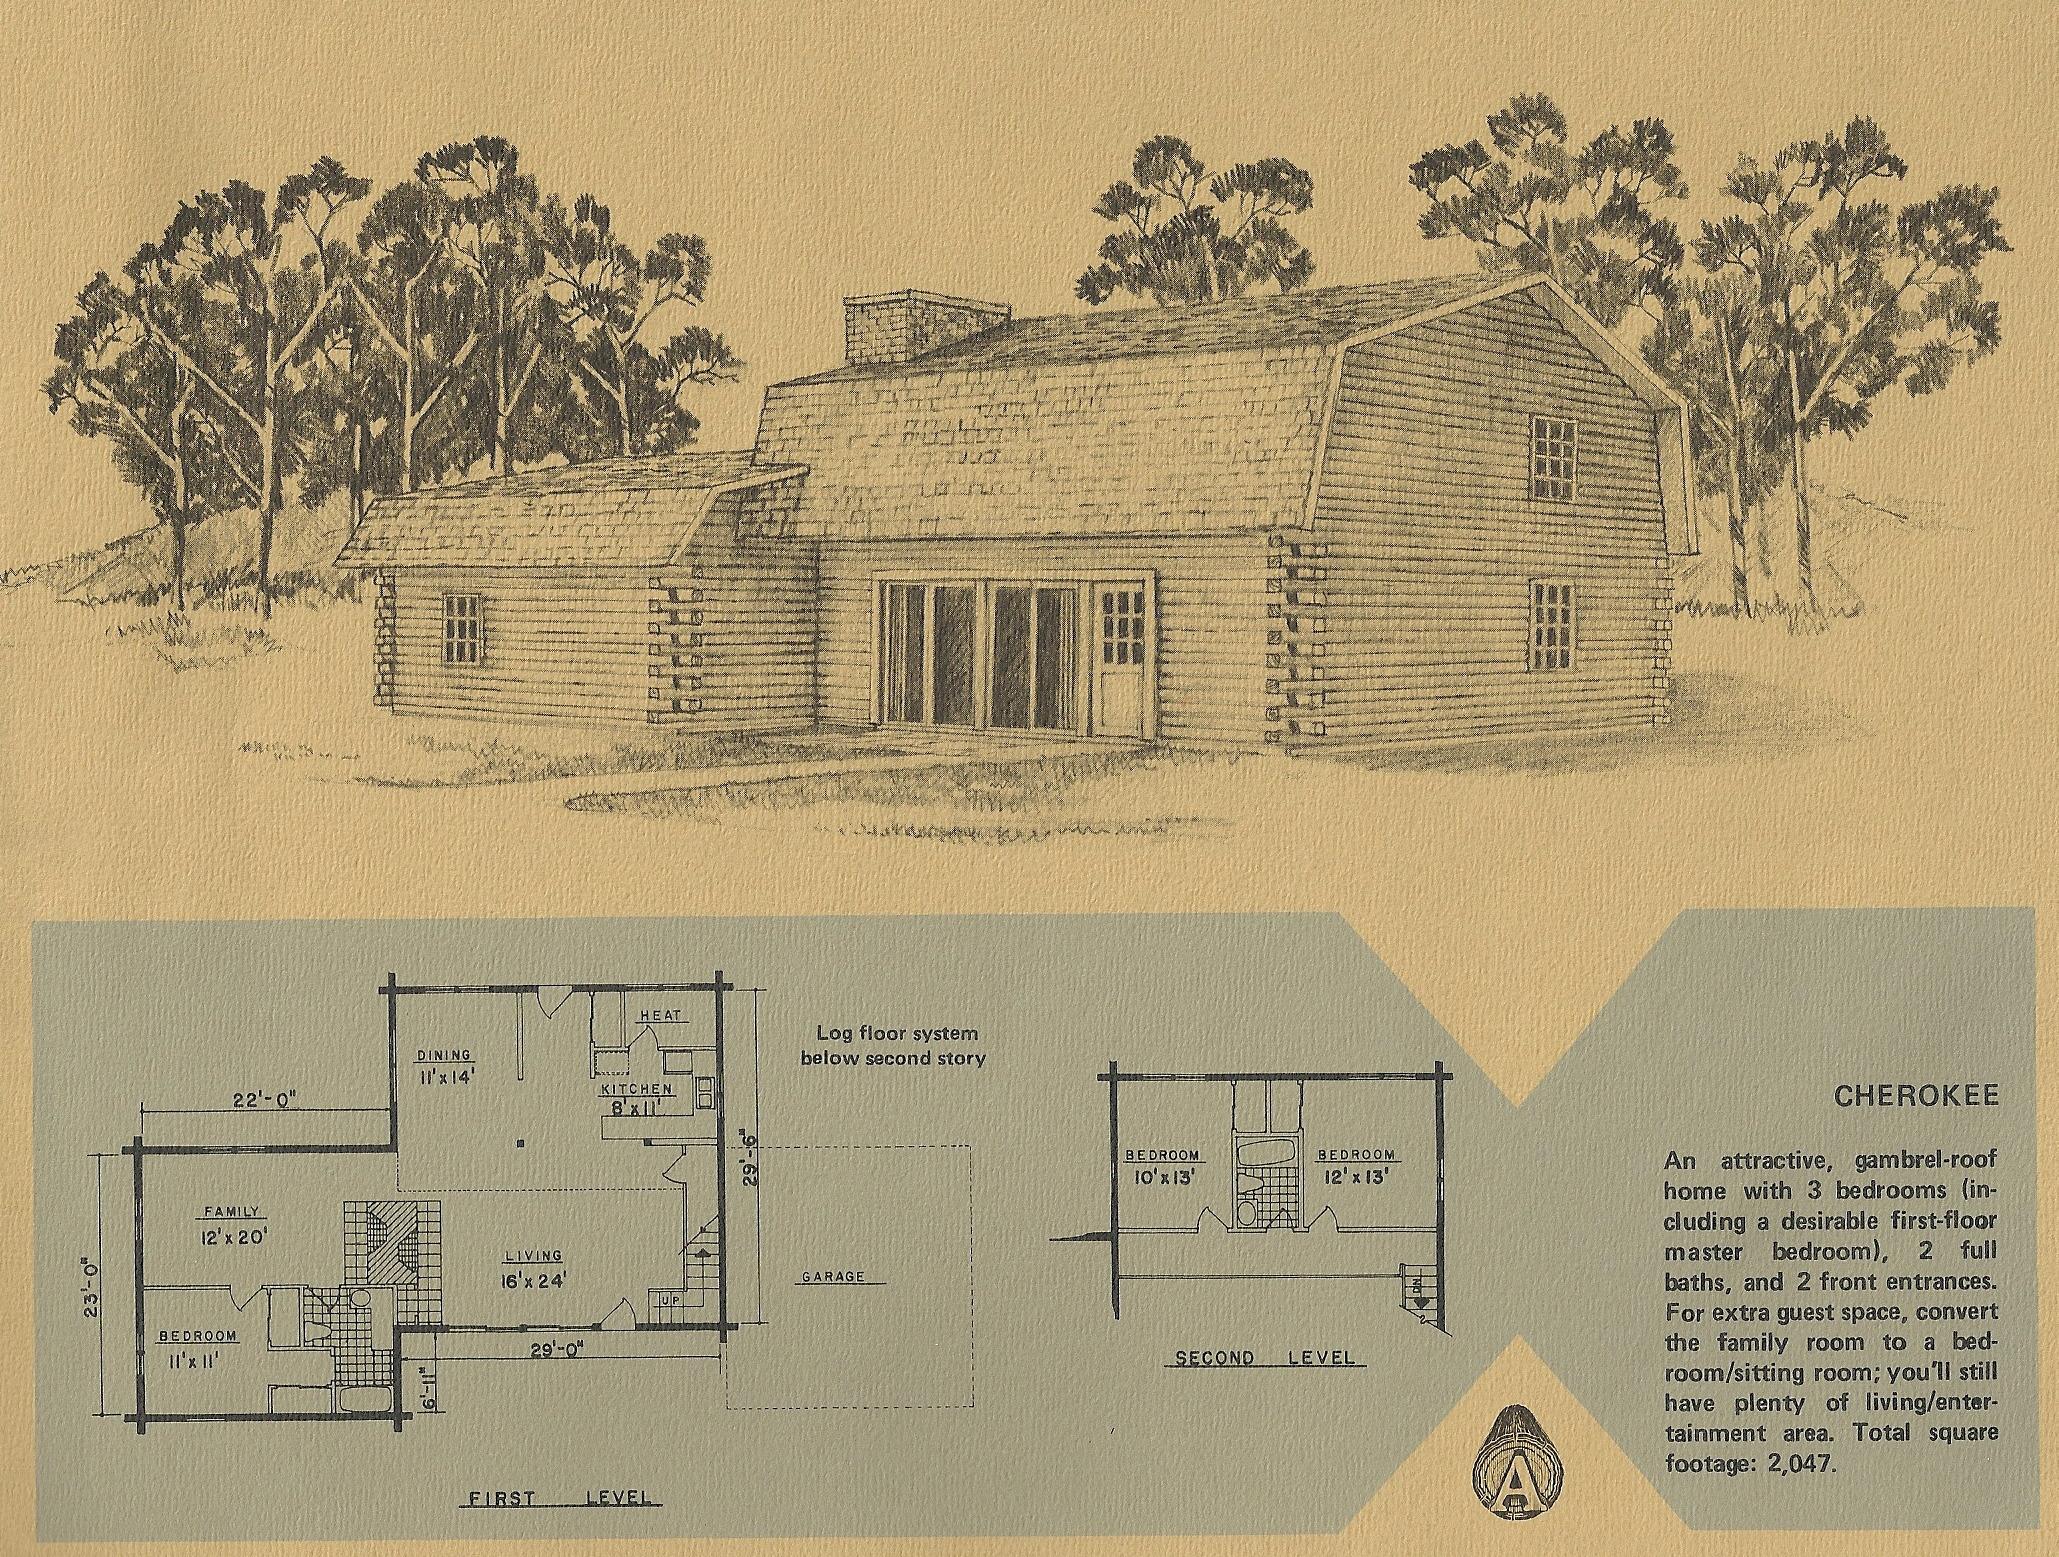 Woodwork celebrity equinox cabin plan plans pdf download for Cabin design software free download